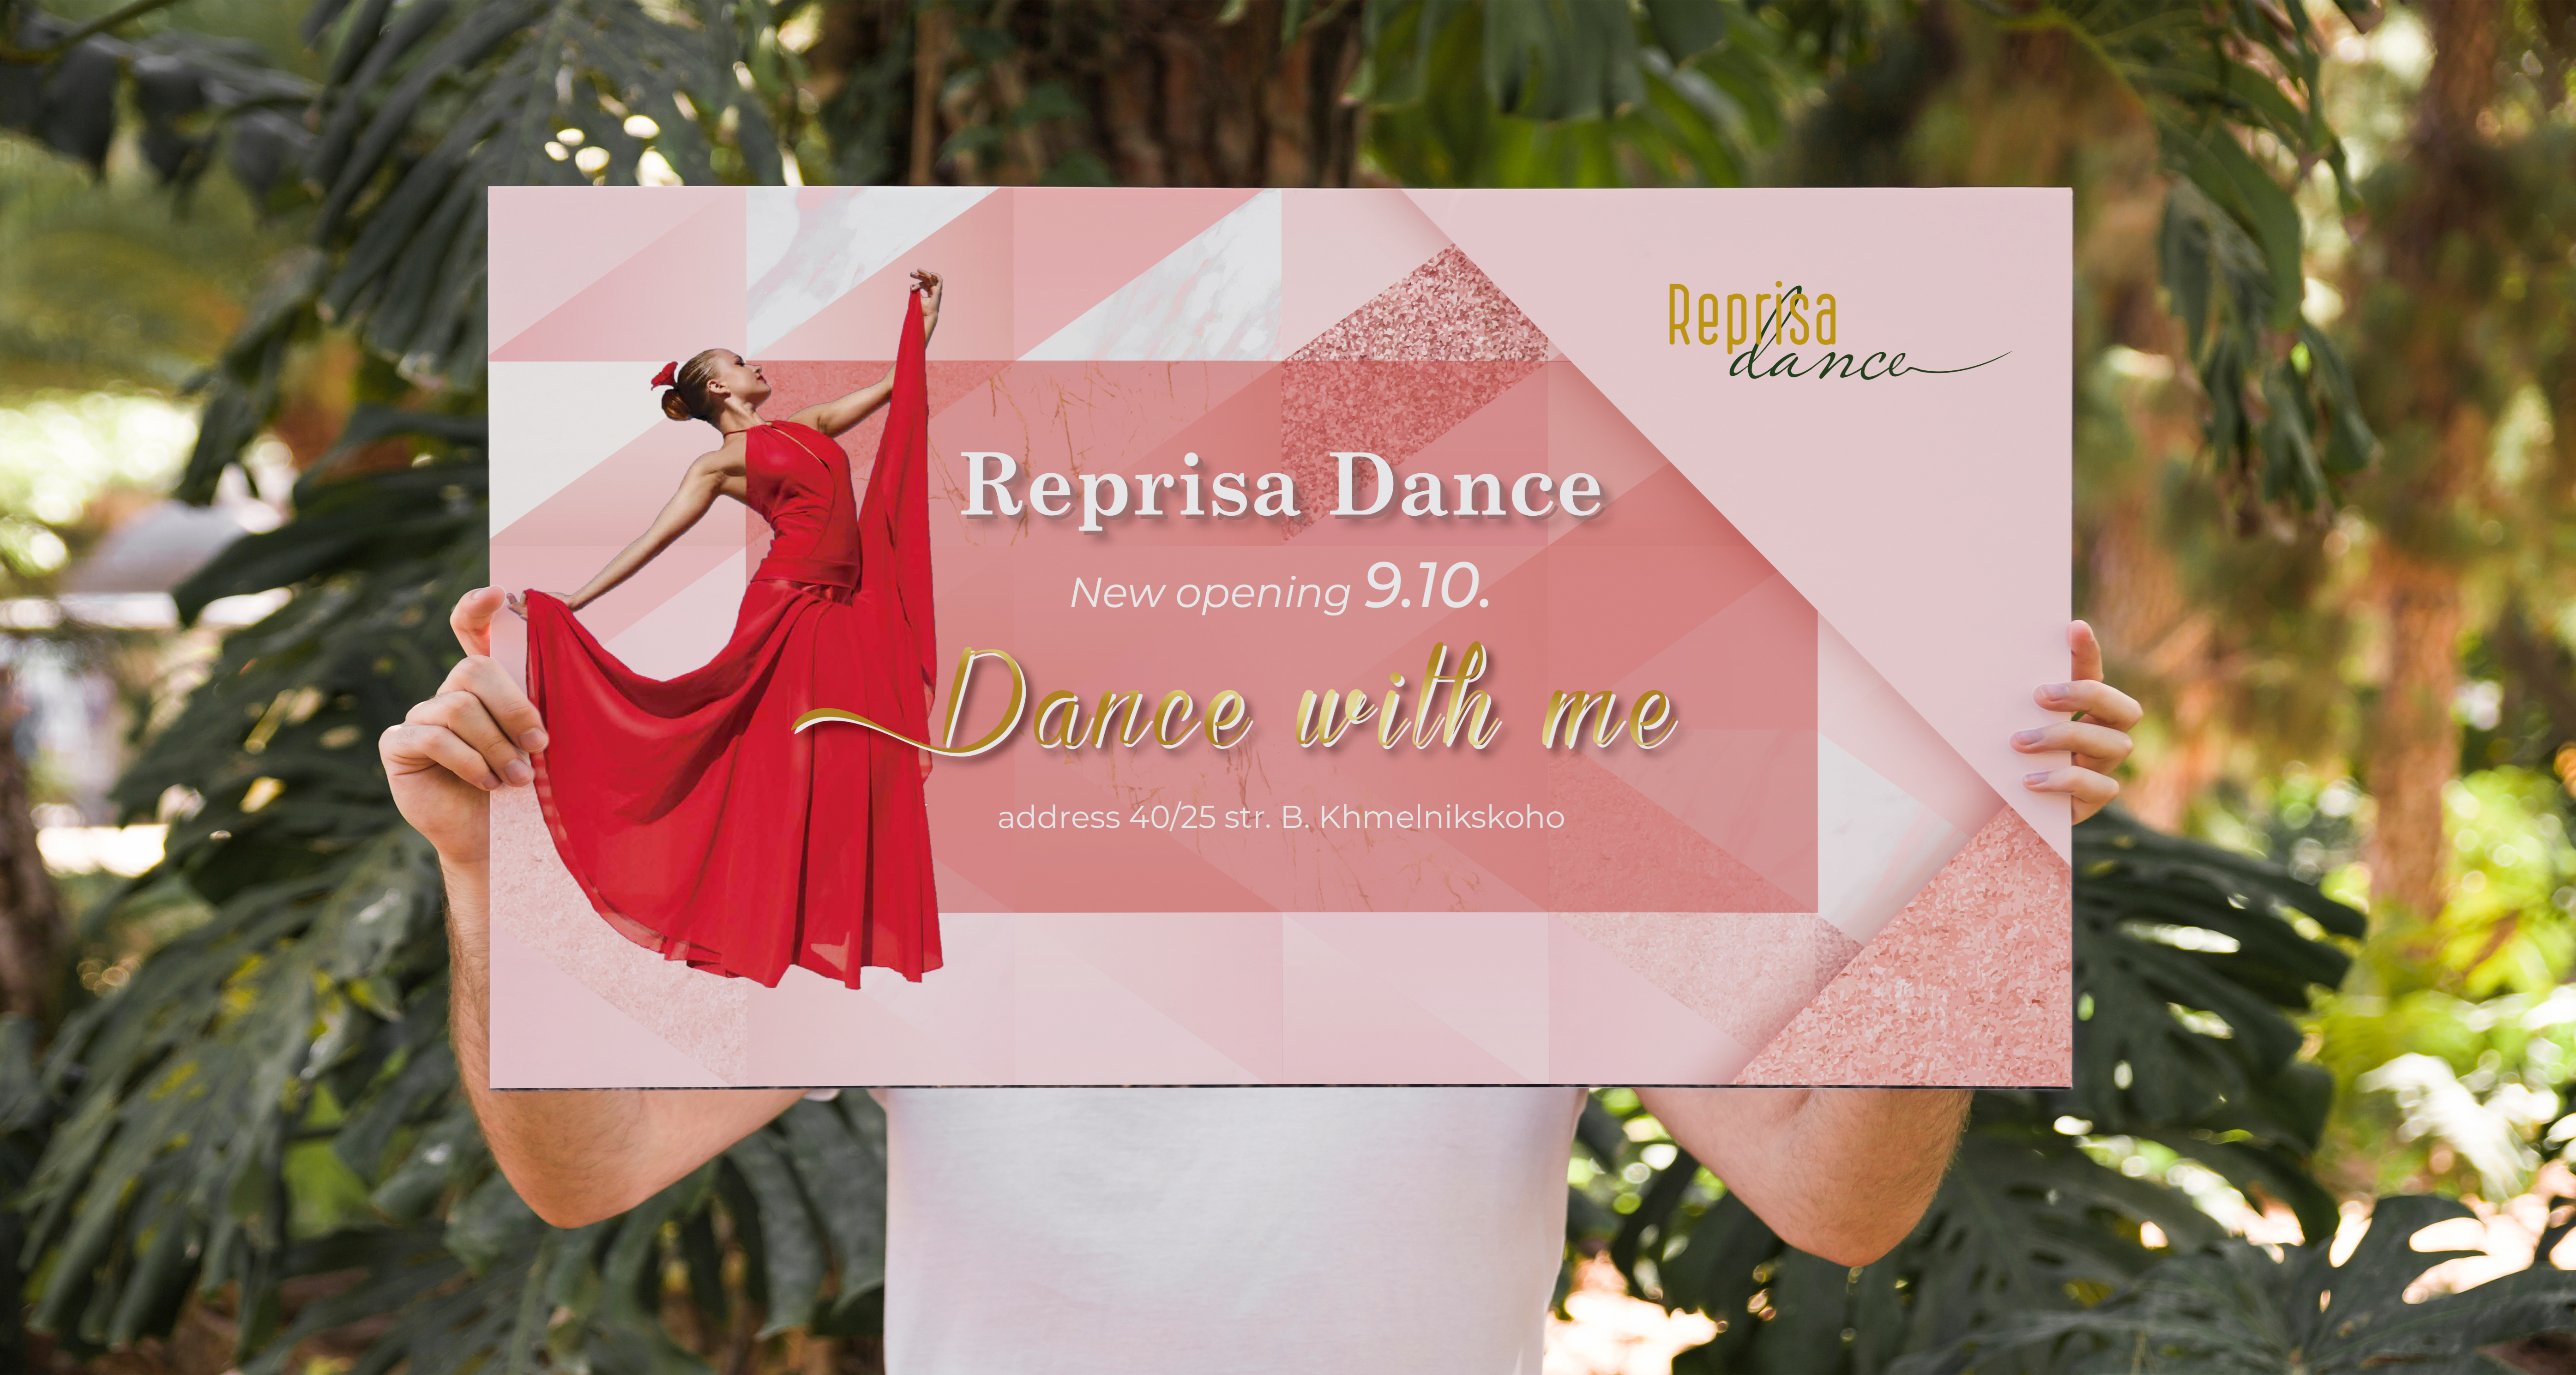 Resprisa Dance Poster